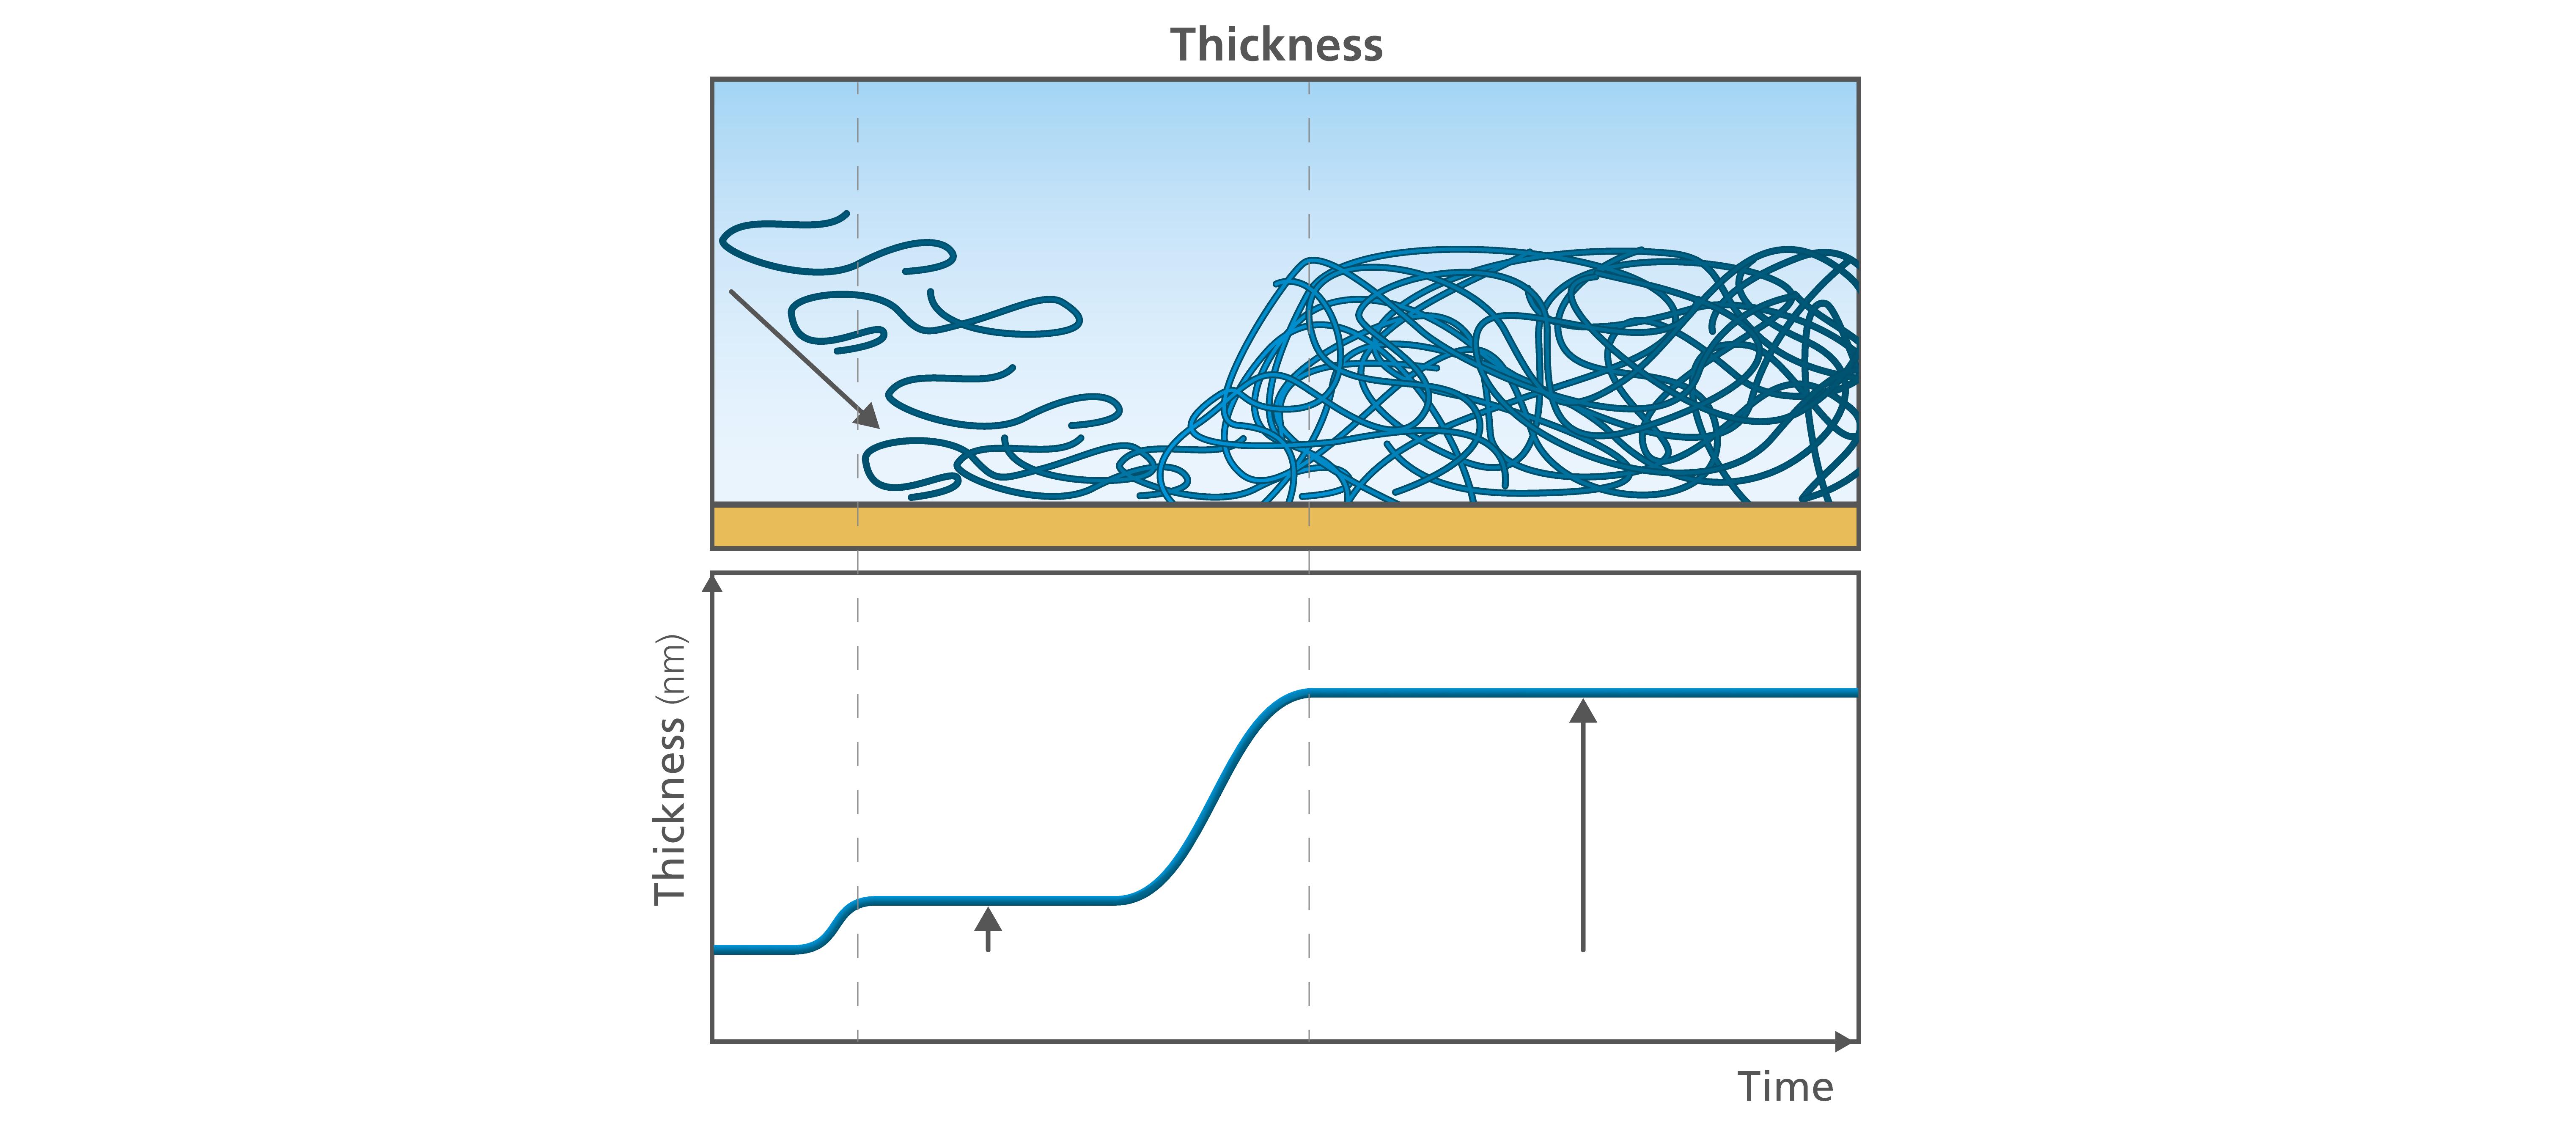 Fig 2. QSense Thickness